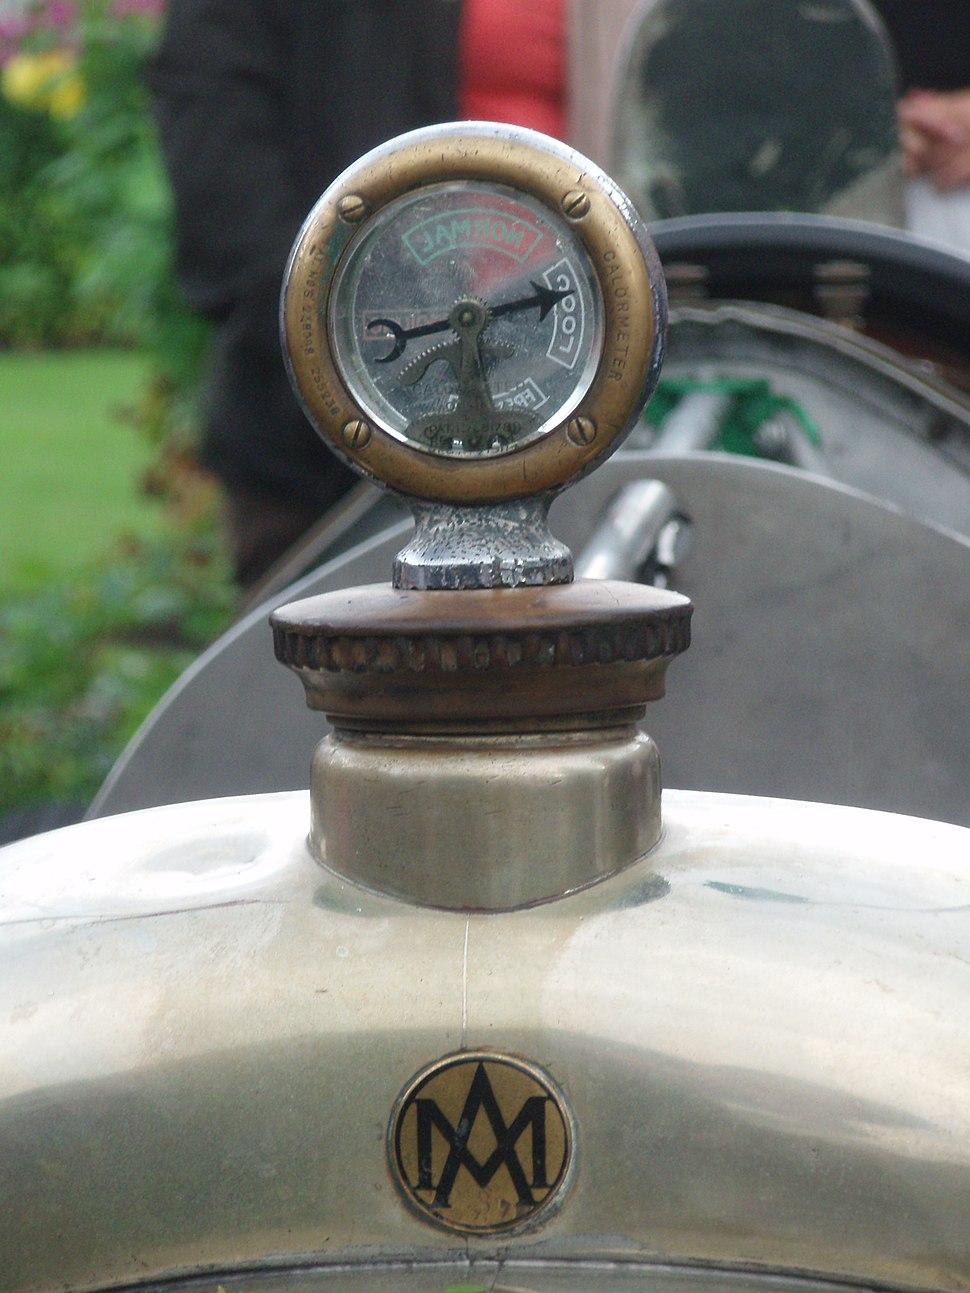 1923 Aston Martin Razor Blade team car in Morges 2013 - AM logo and radiator calormeter closeup